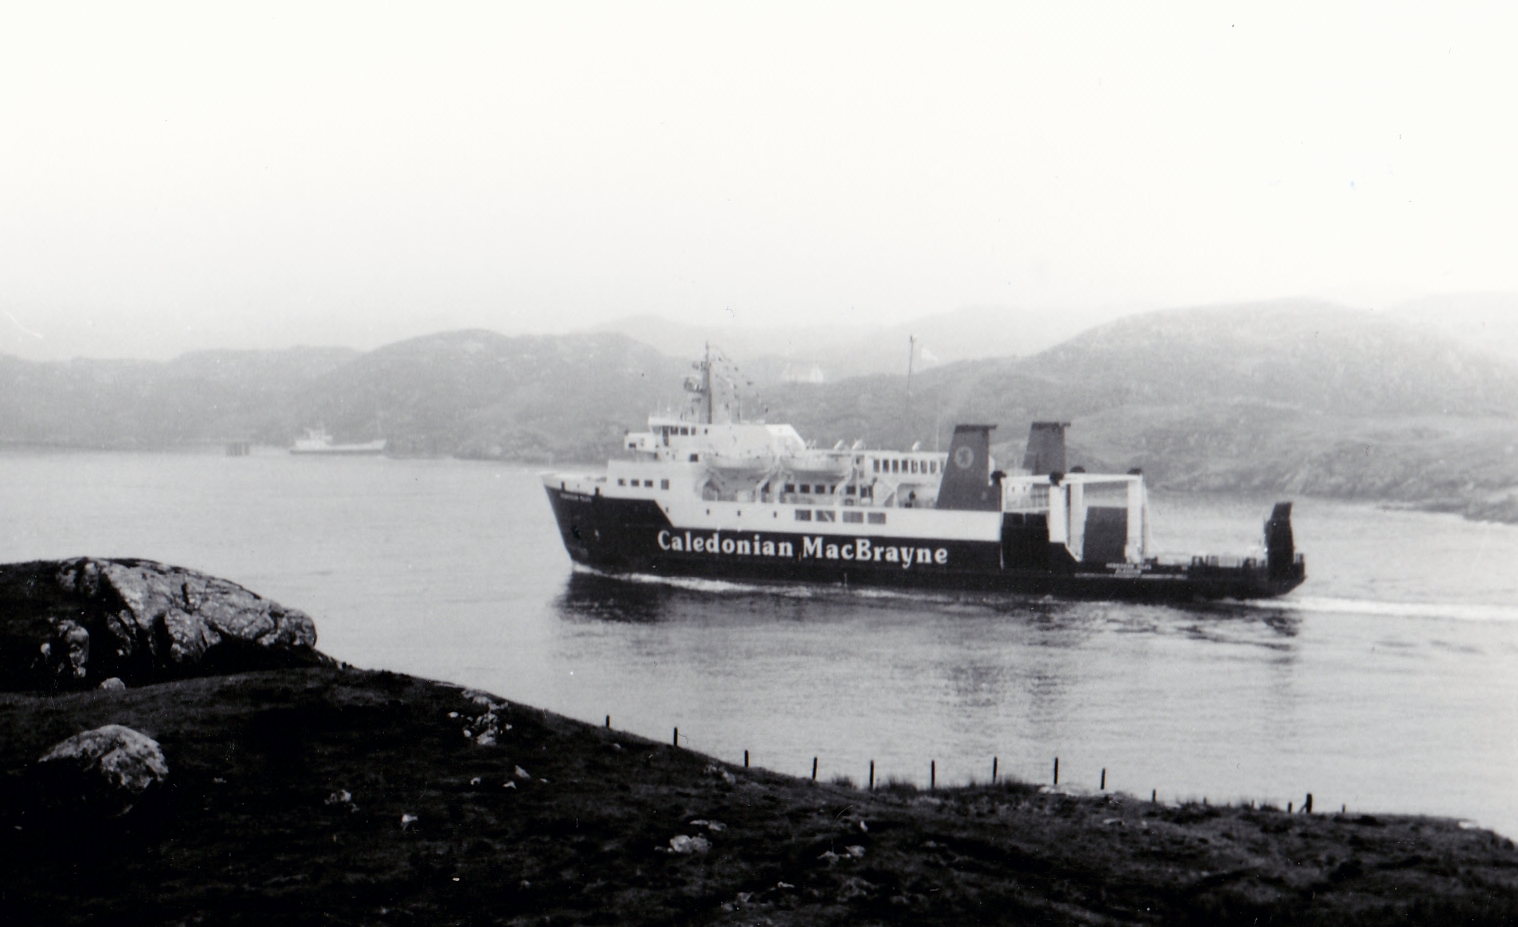 Hebridean Isles and Kilbrannan 1986